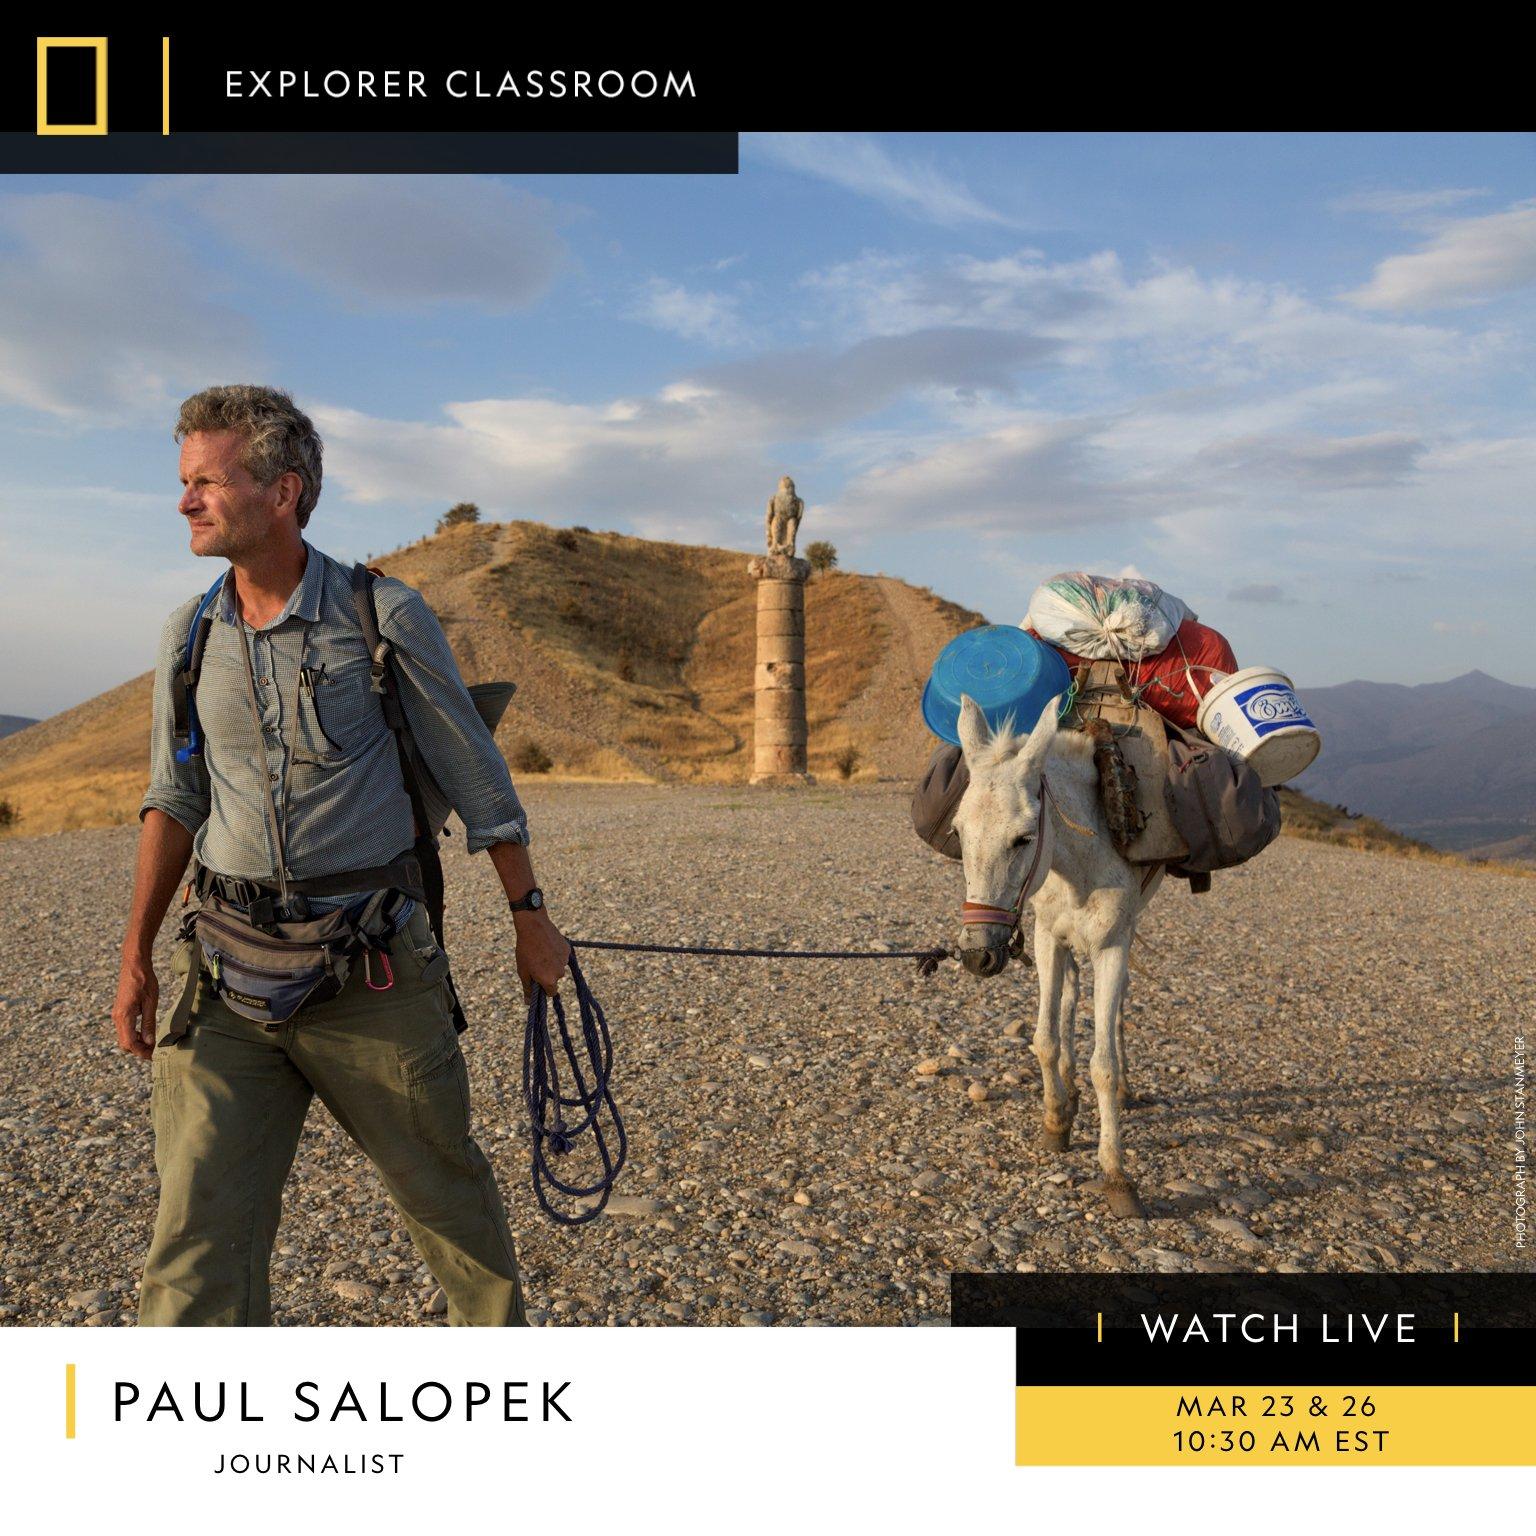 Explorer Classroom